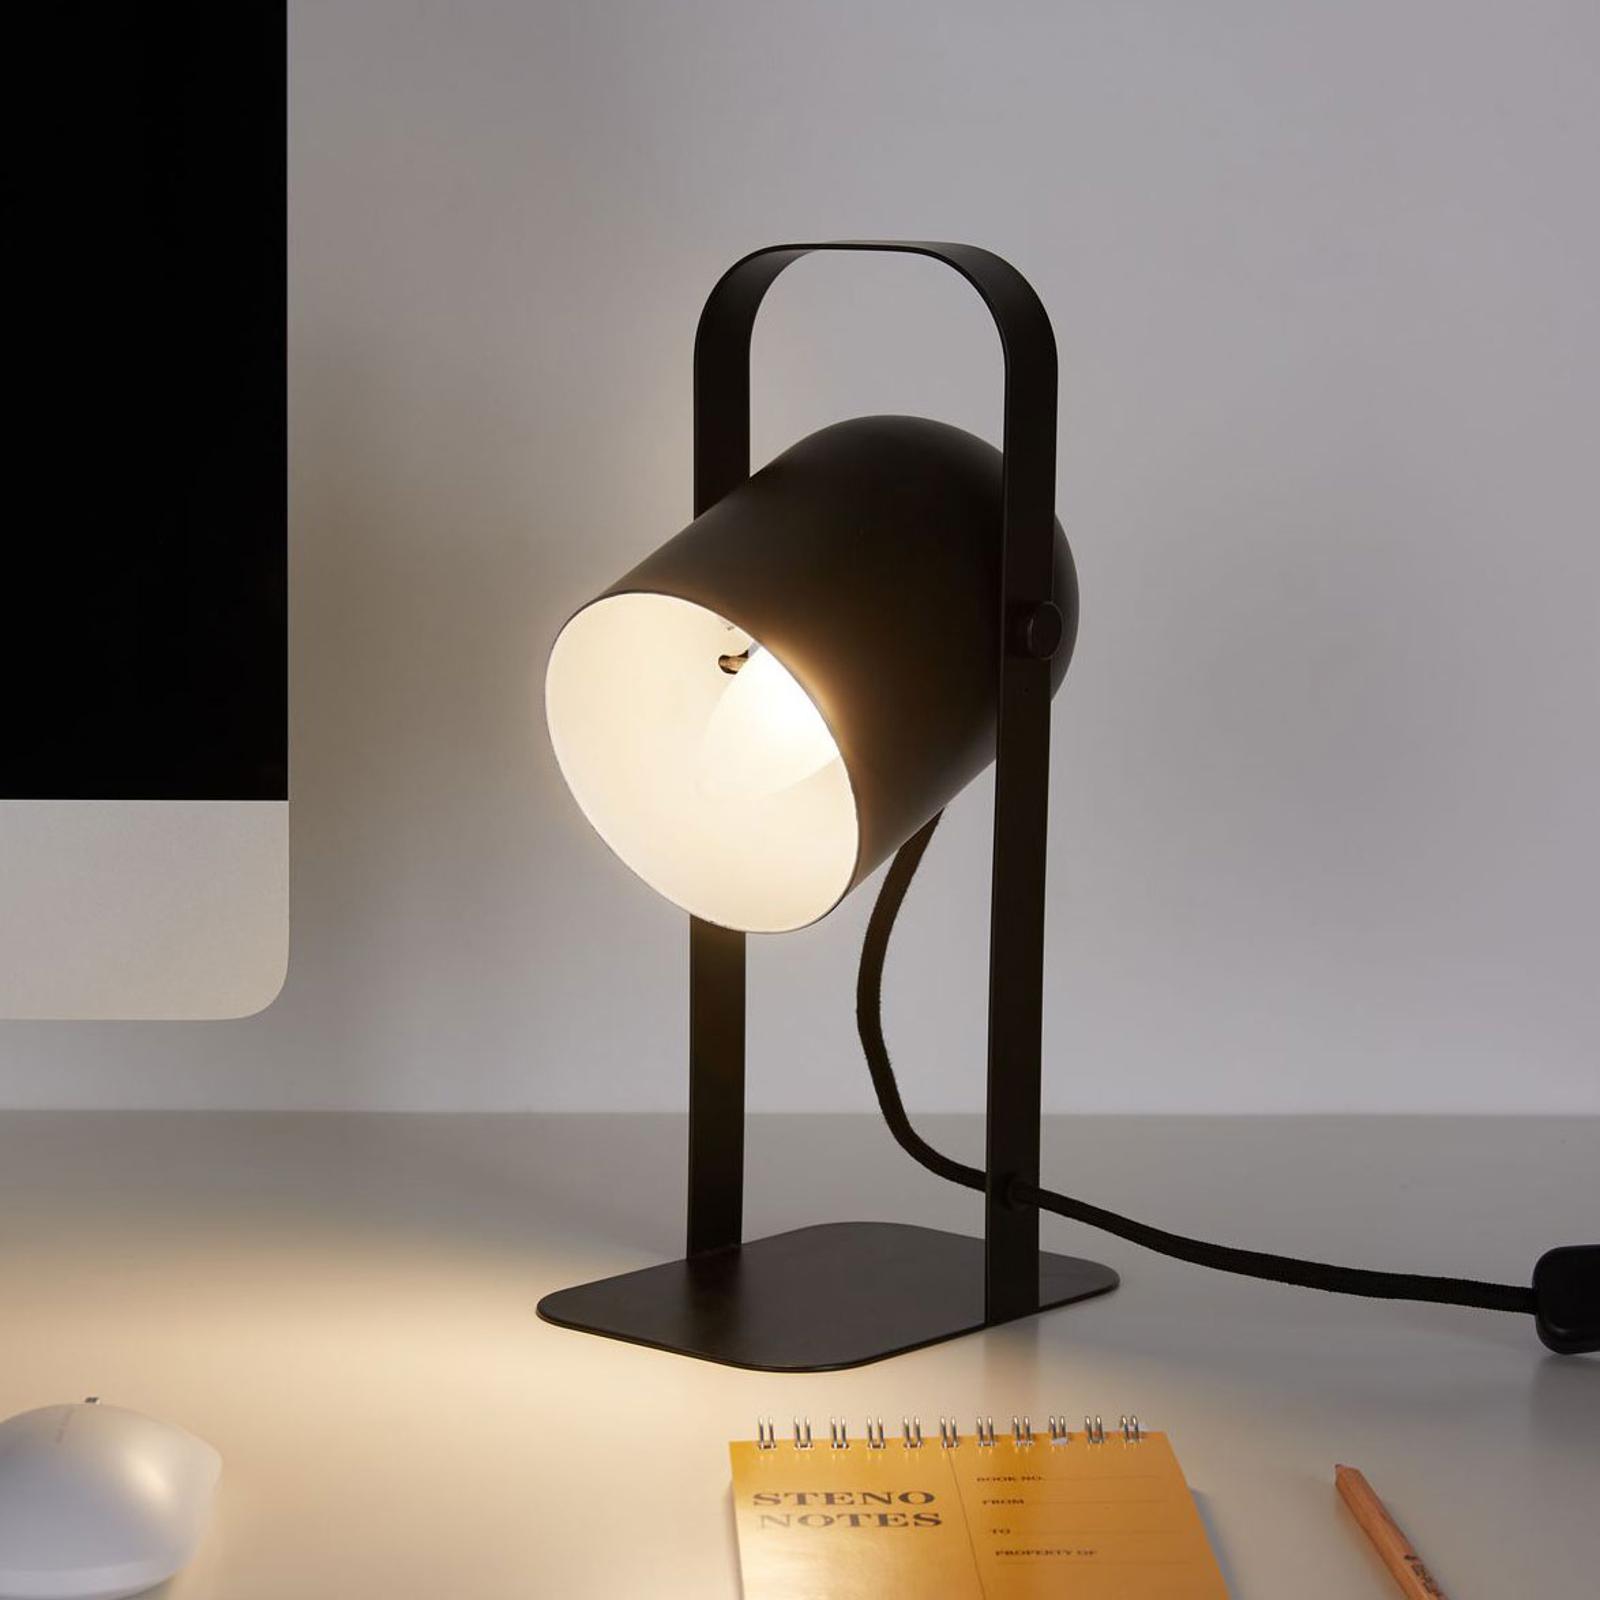 Pauleen True Crush bordslampa av metall